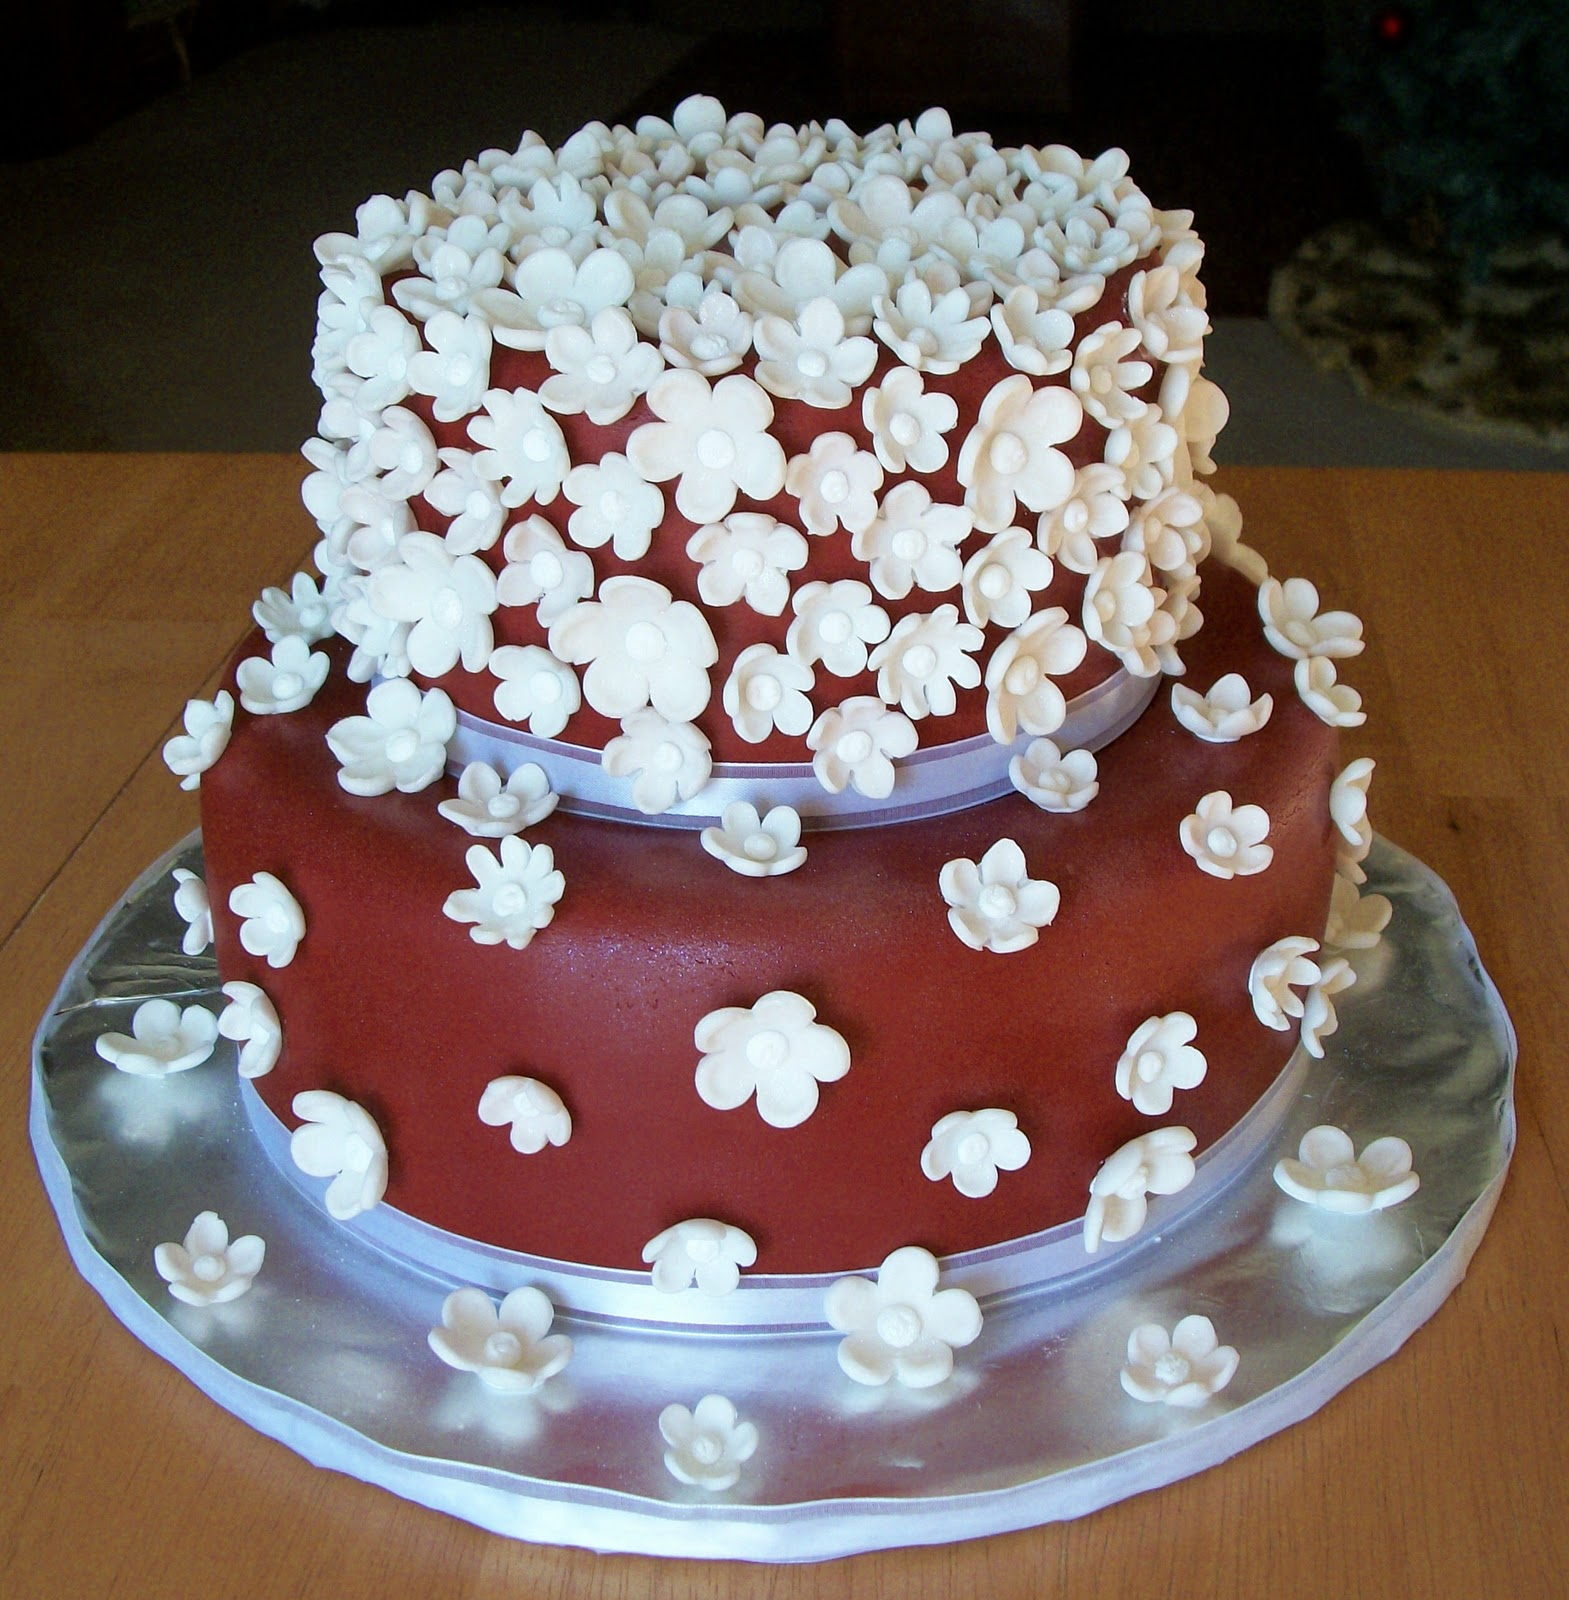 25th Wedding Anniversary Cakes: Bellissimo! Specialty Cakes: 25th Anniversary Cake